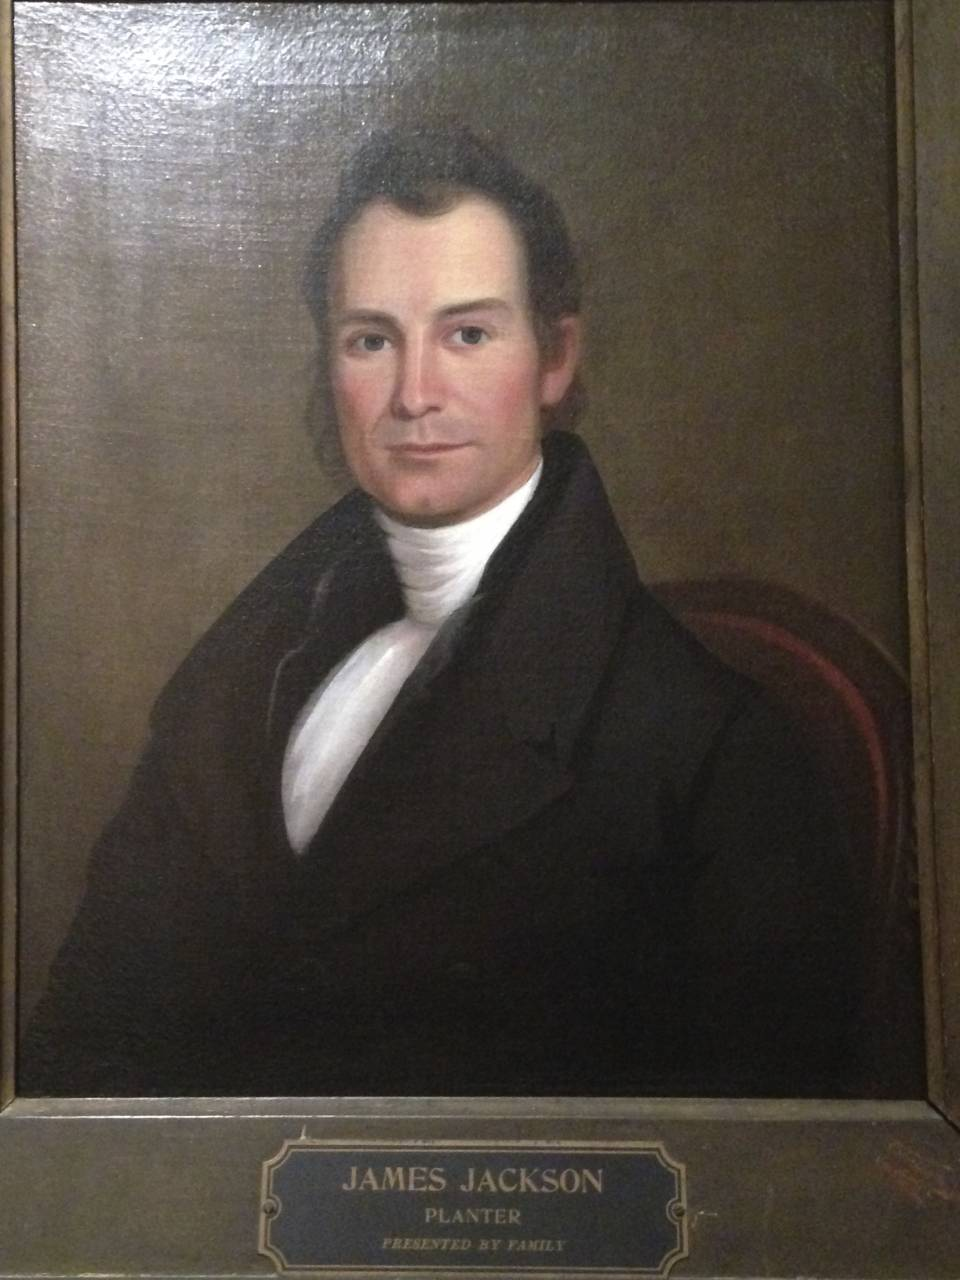 James Jackson, Planter